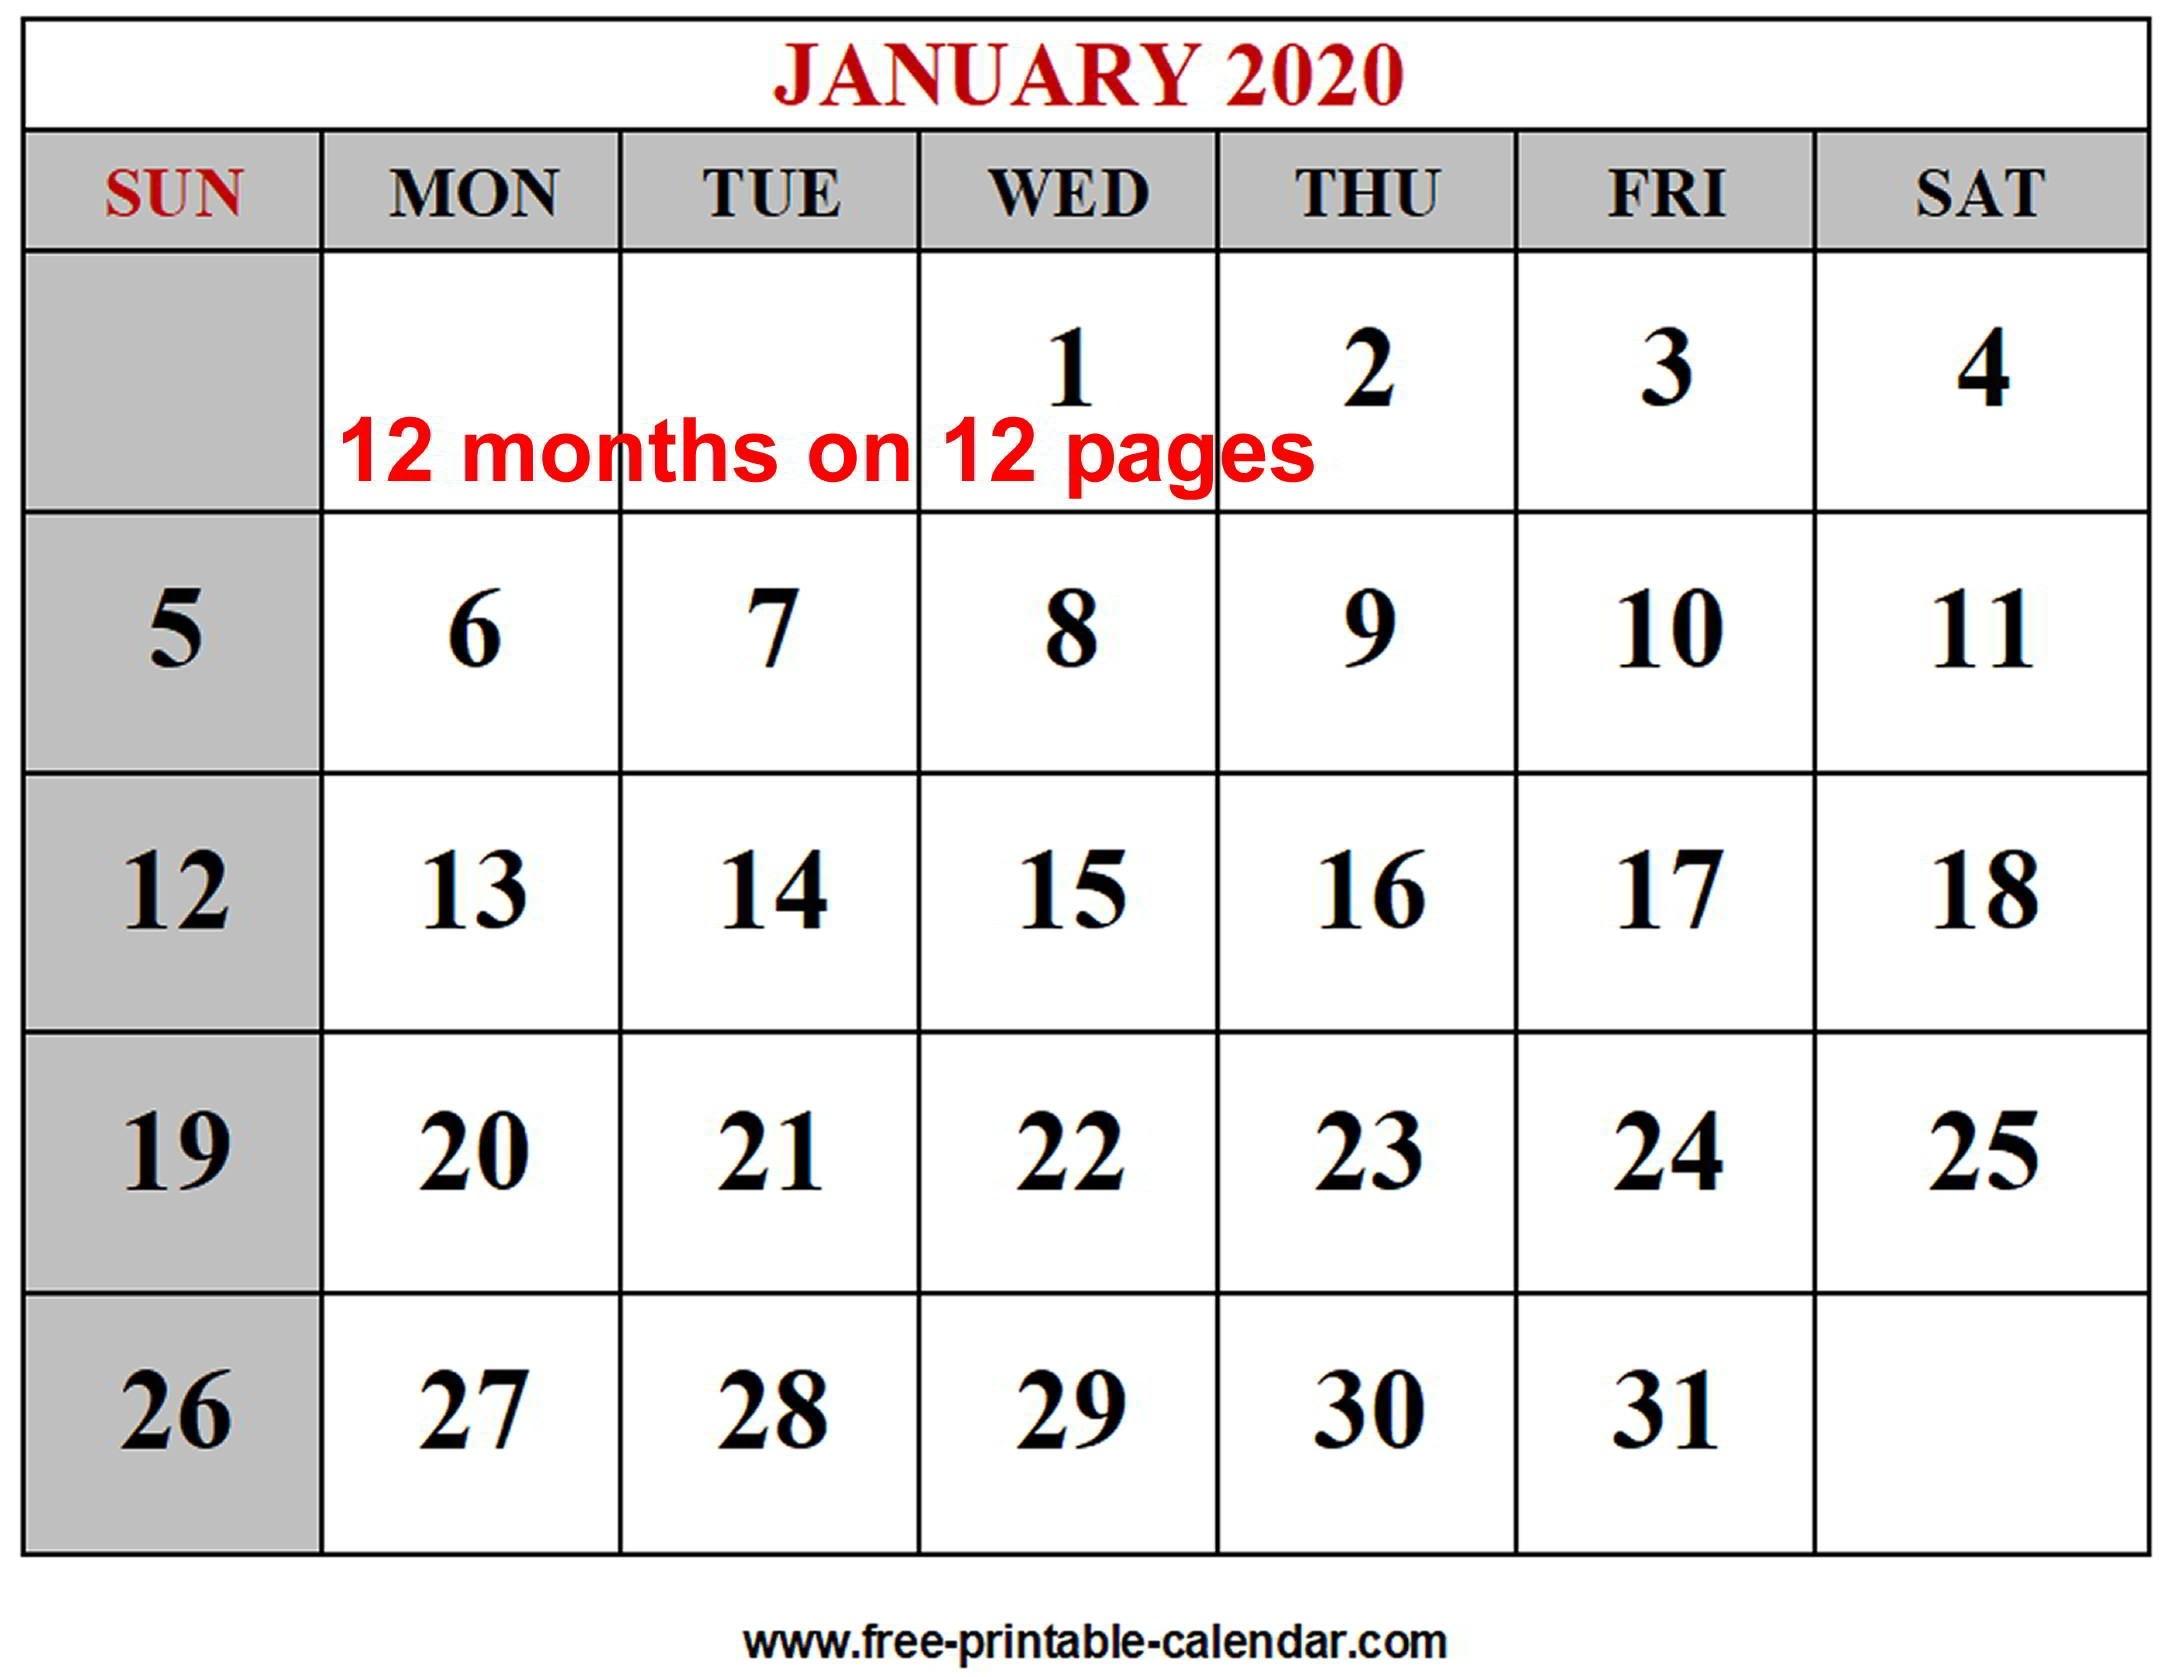 Year 2020 Calendar Templates - Free-Printable-Calendar  12 Month Calendar 2020 Printable Free